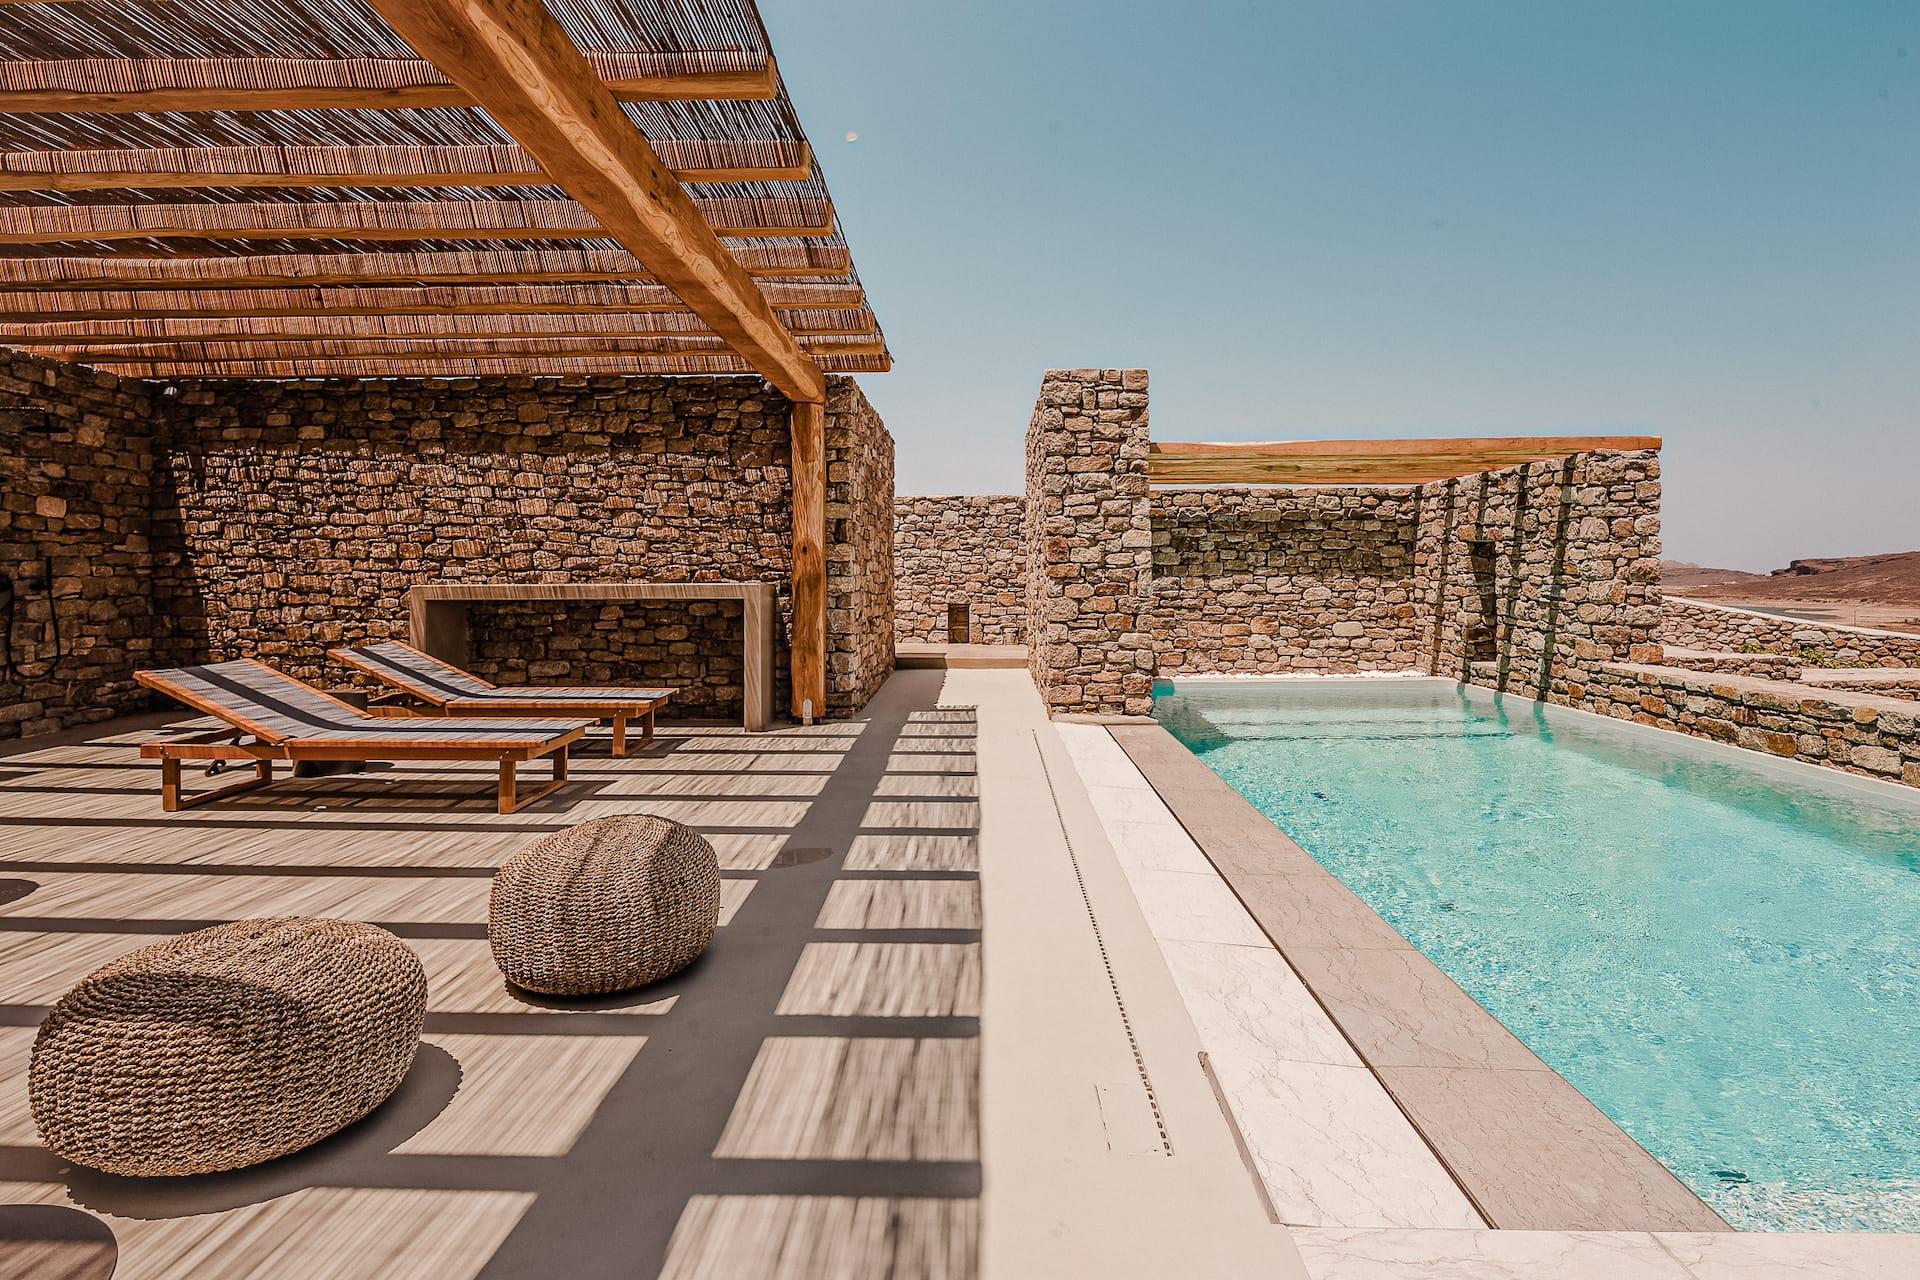 The villa Lito private outdoor pool & terrace with sunbeds. A luxury villa in Ftelia, Mykonos.